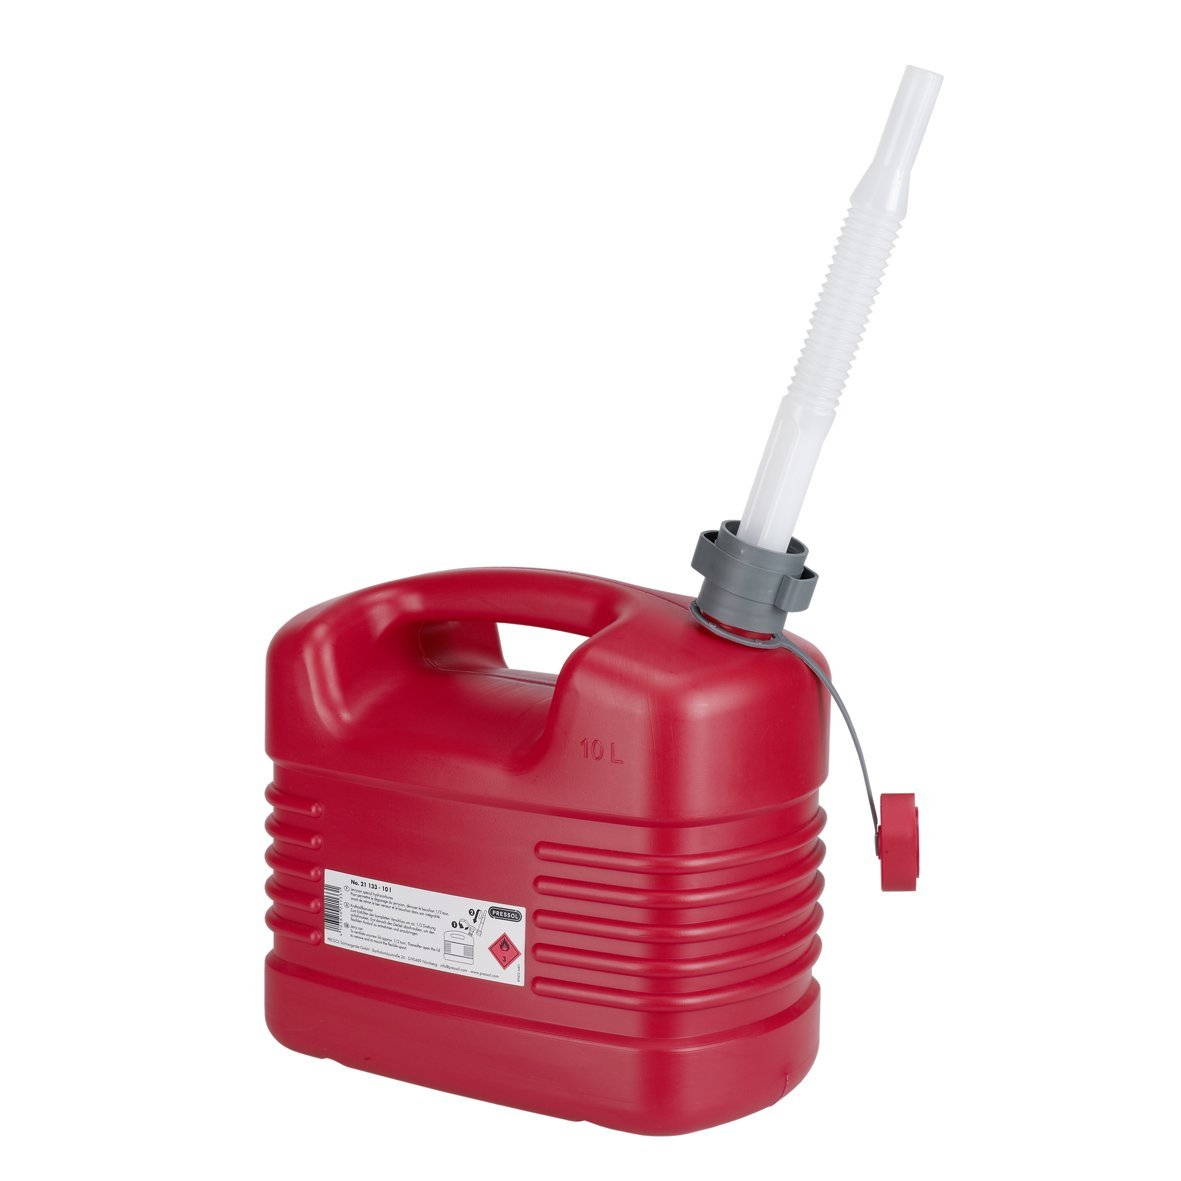 Pressol 4682952 Fluid Canister Polyethylene 10 L